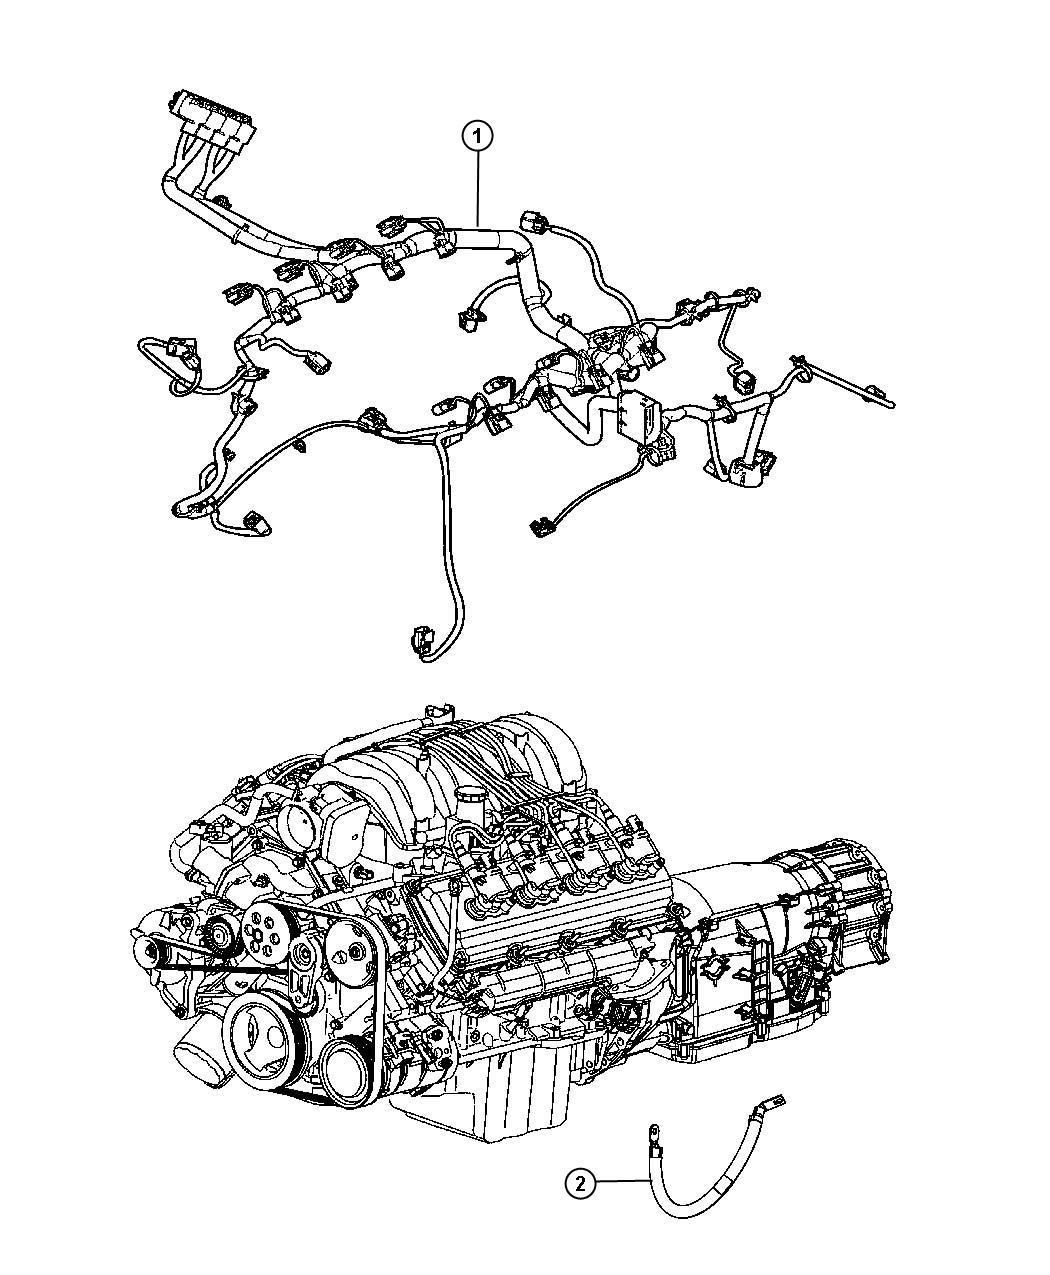 Jeep Grand Cherokee Wiring. Injector. Engine, mopar